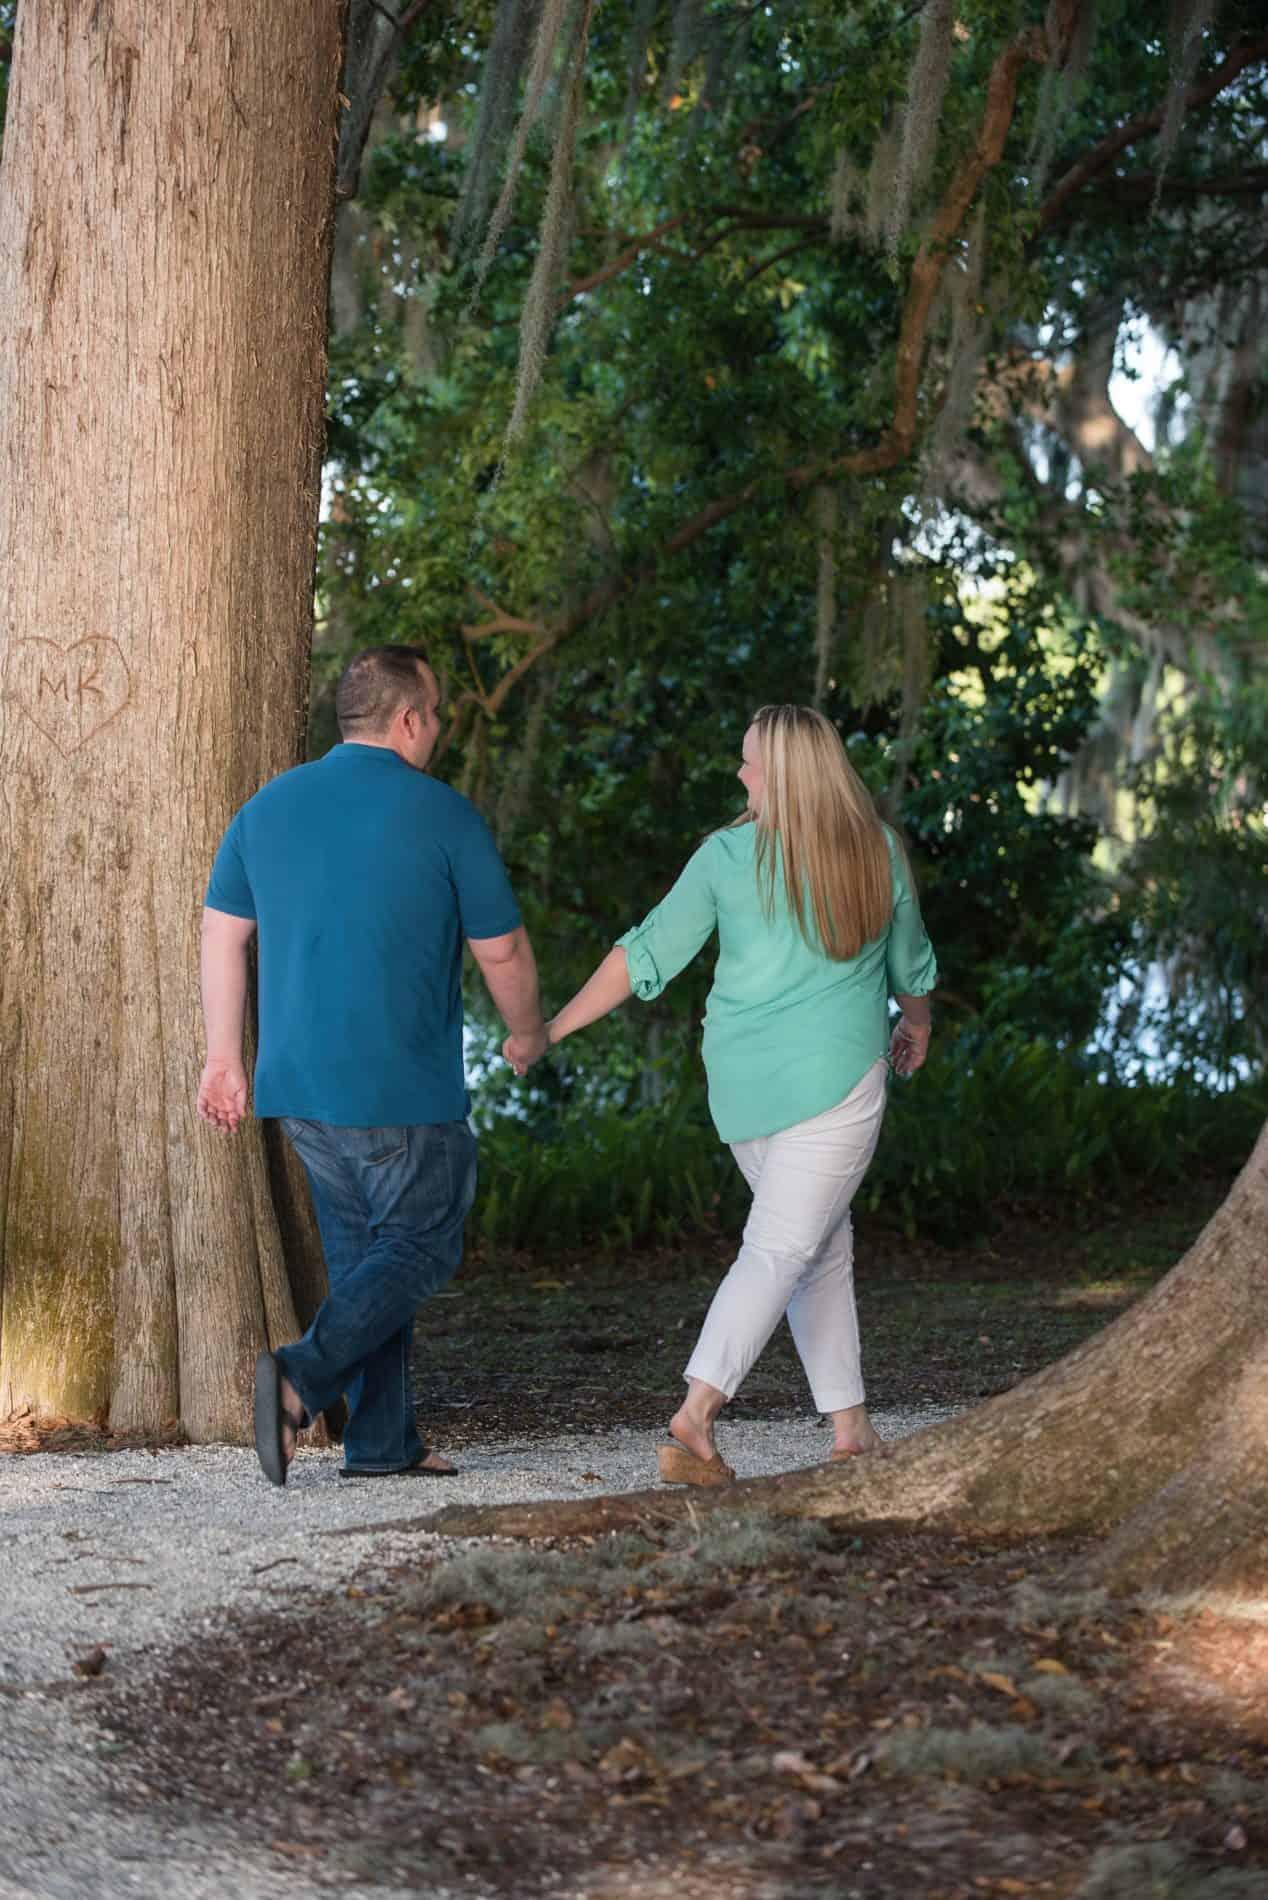 Engaged couple walking through park in Florida